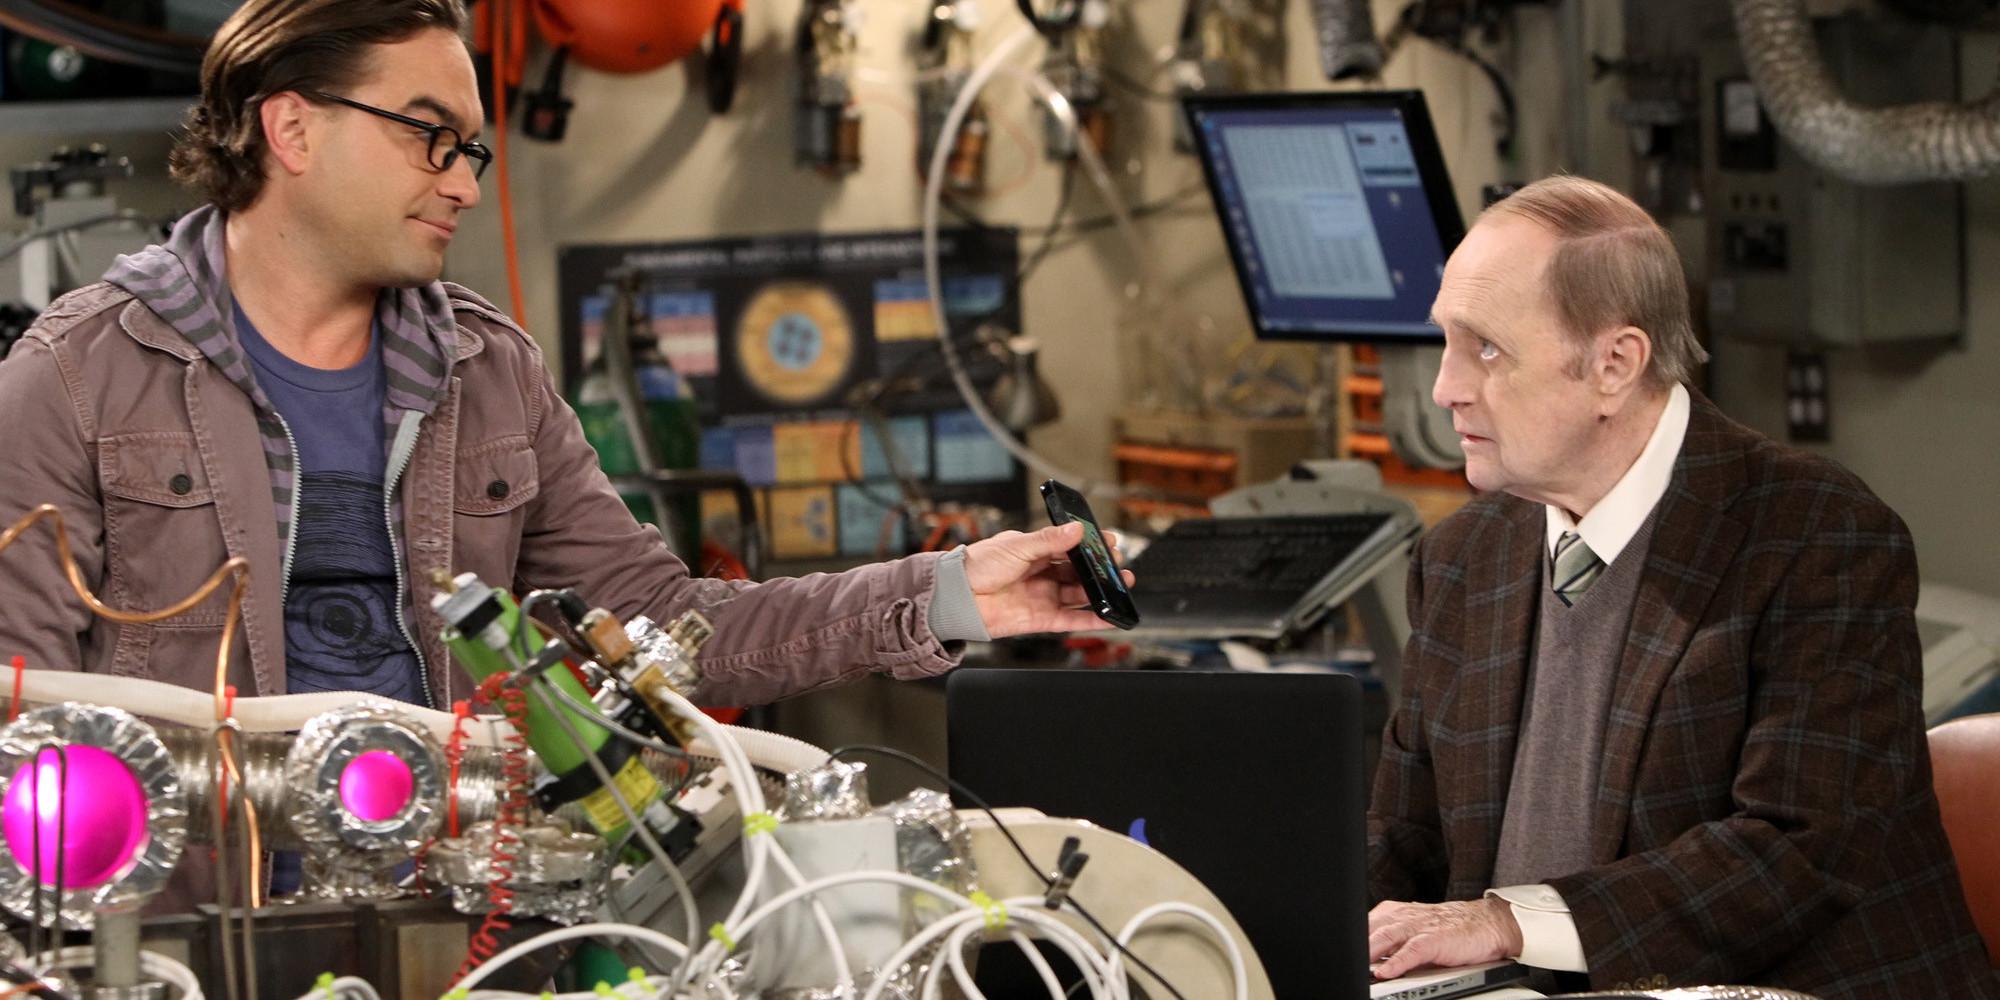 Big Bang Theory' Recap: Sheldon Vs. Newhart Round Two | Alex ...: www.huffingtonpost.com/alex-rabinowitz/big-bang-theory-recap-she_b...